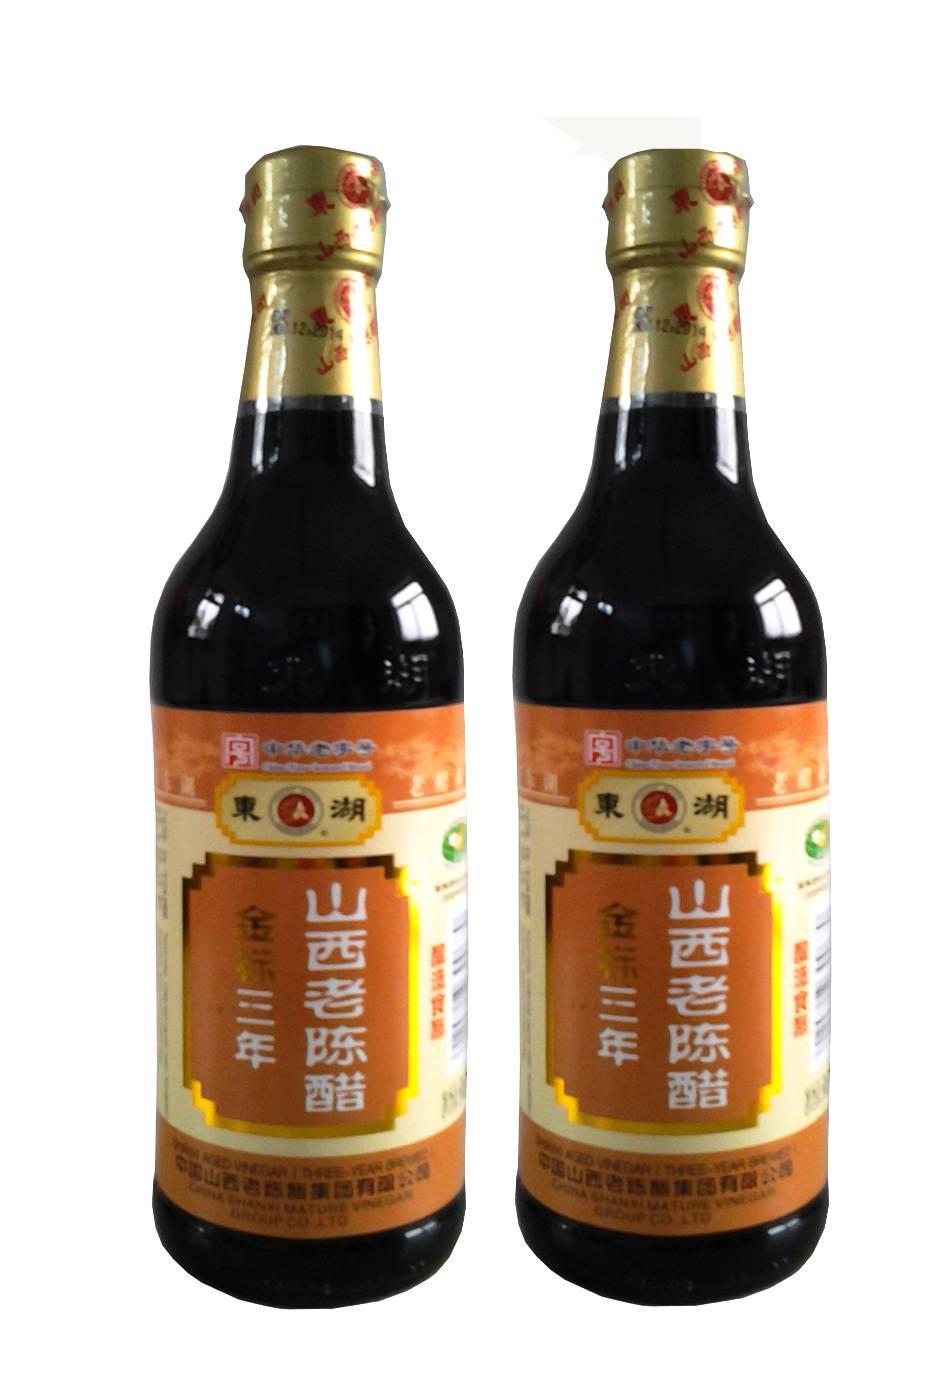 Donghu Brand Shanxi Three-year Aged Vinegar